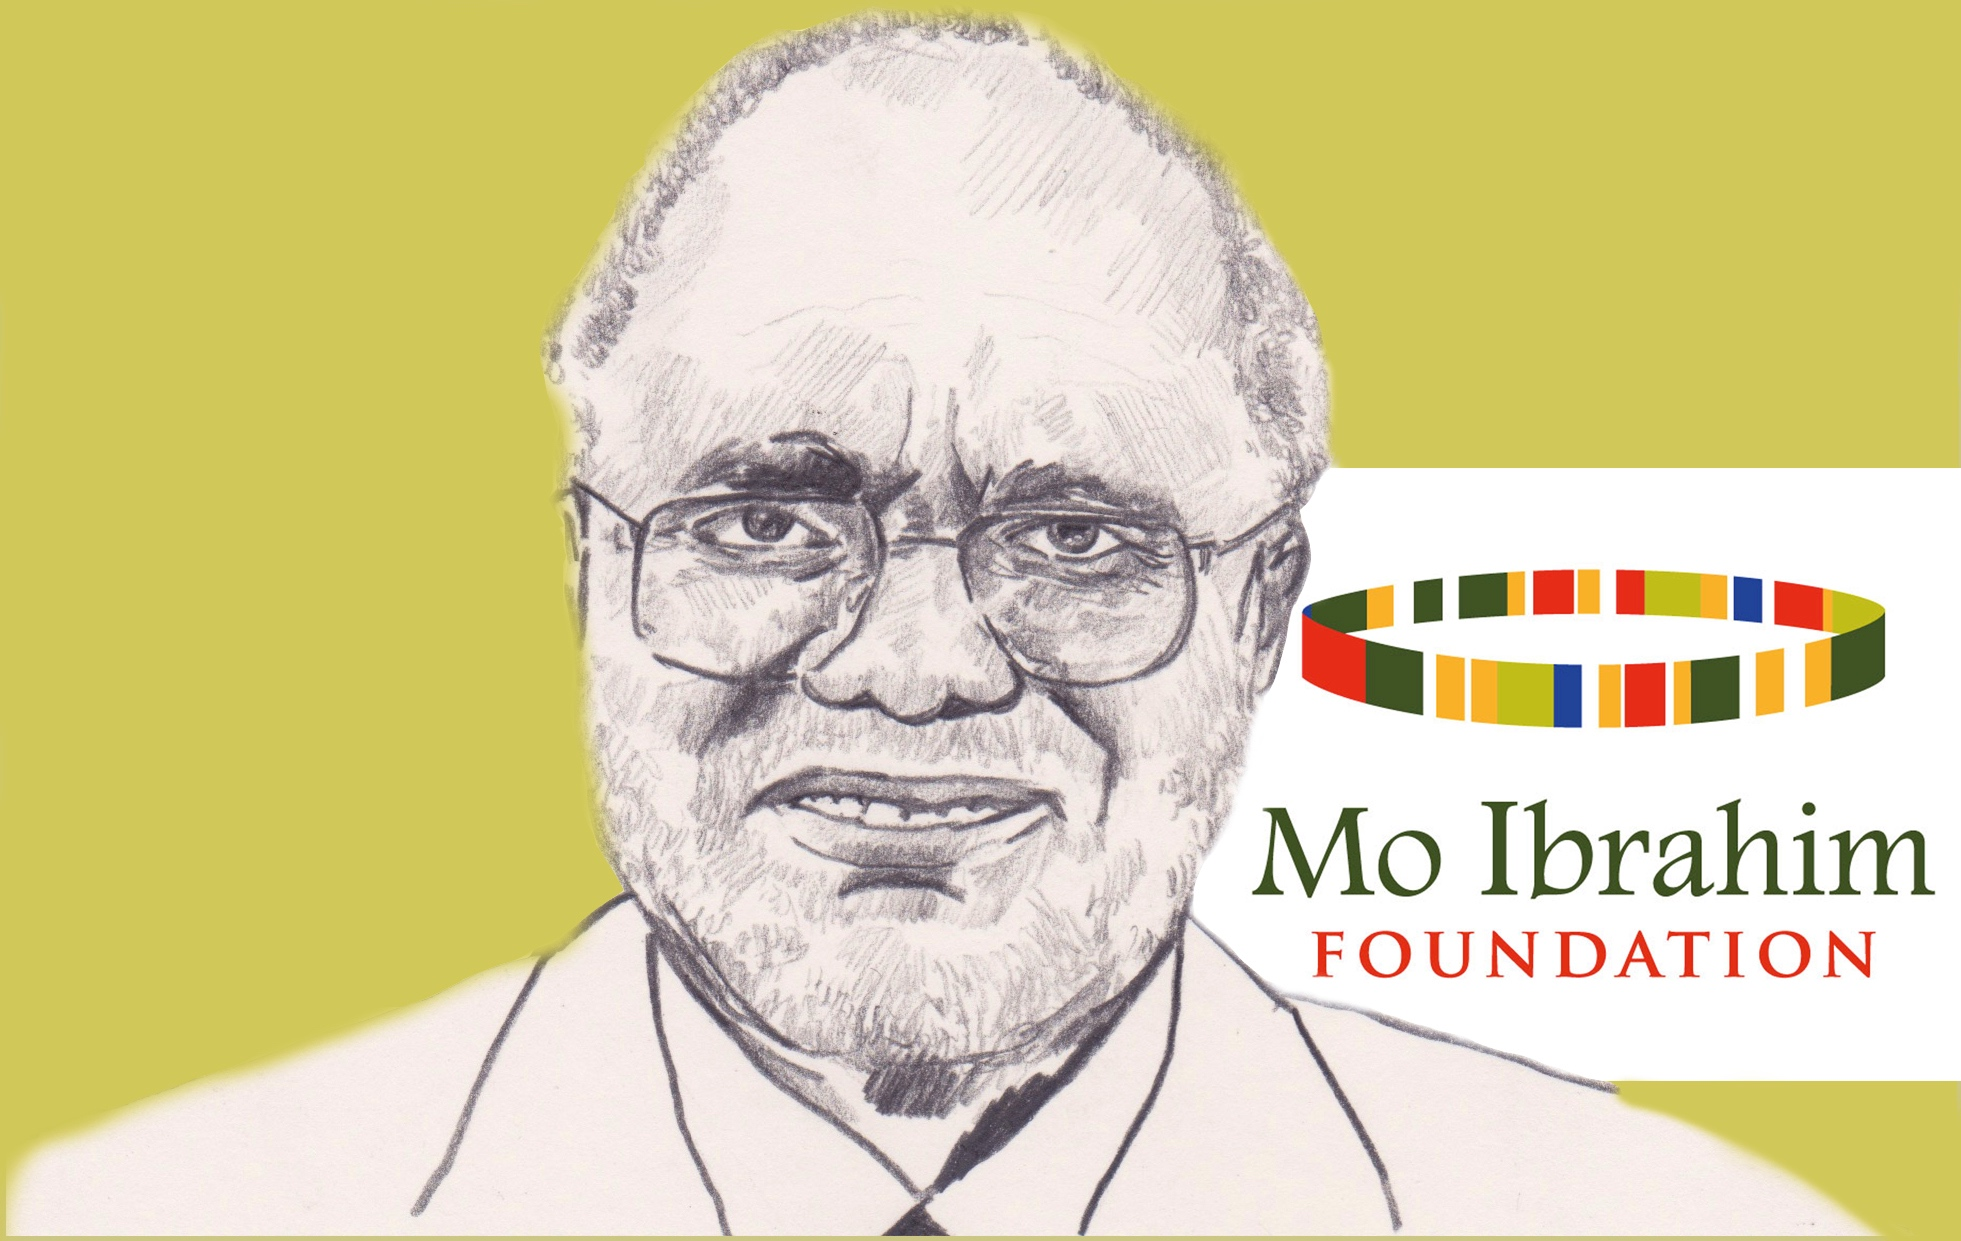 02/03/15  Namibia's outgoing President Hifikepunye Pohamba, 79, wins the Mo Ibrahim Foundation's African leadership prize of $ 5 million